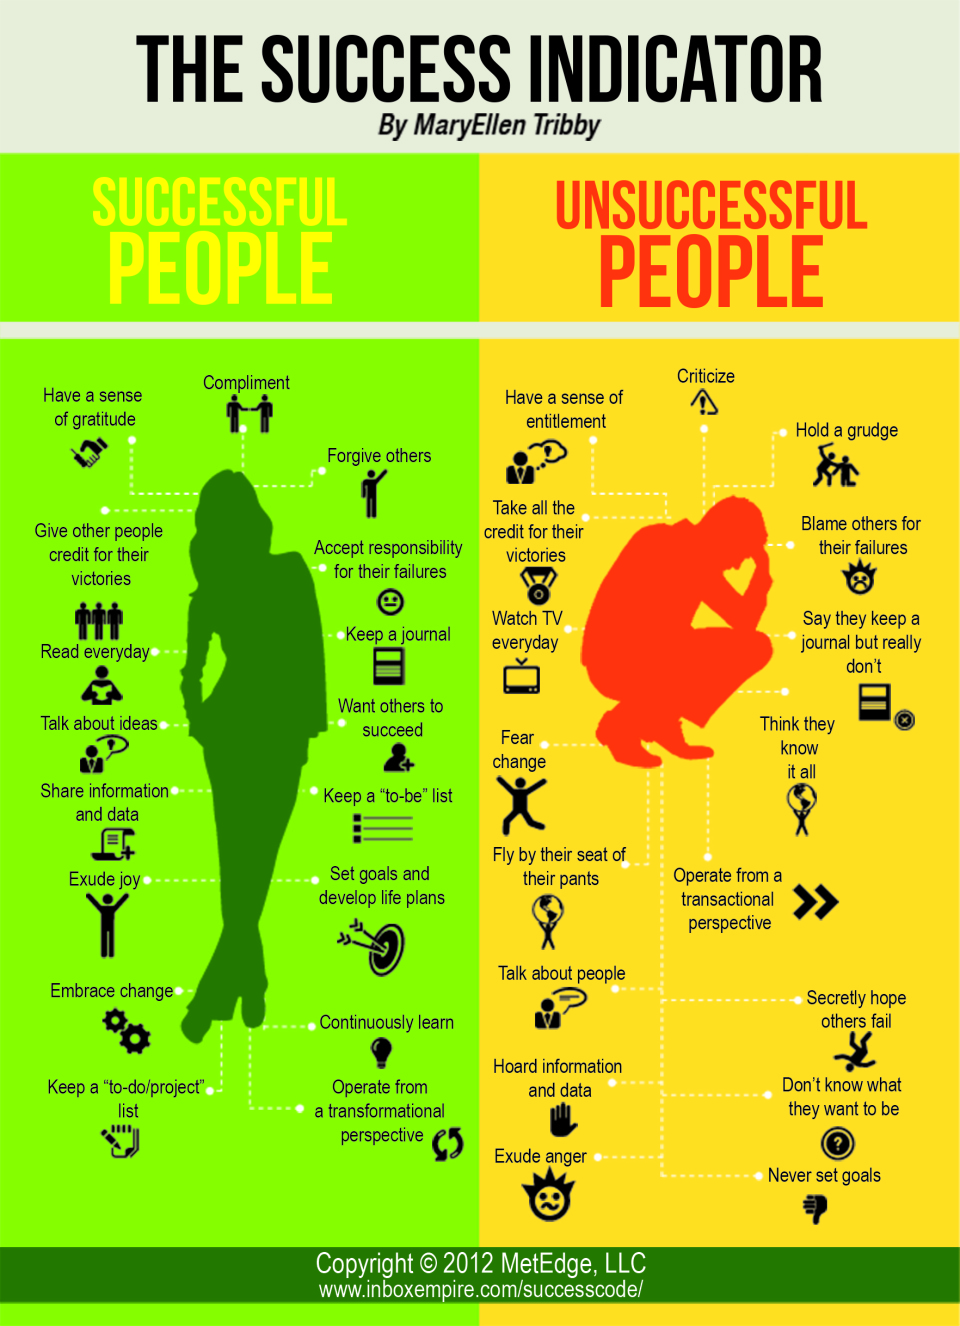 thesuccessindicator-infographic-poster.jpg